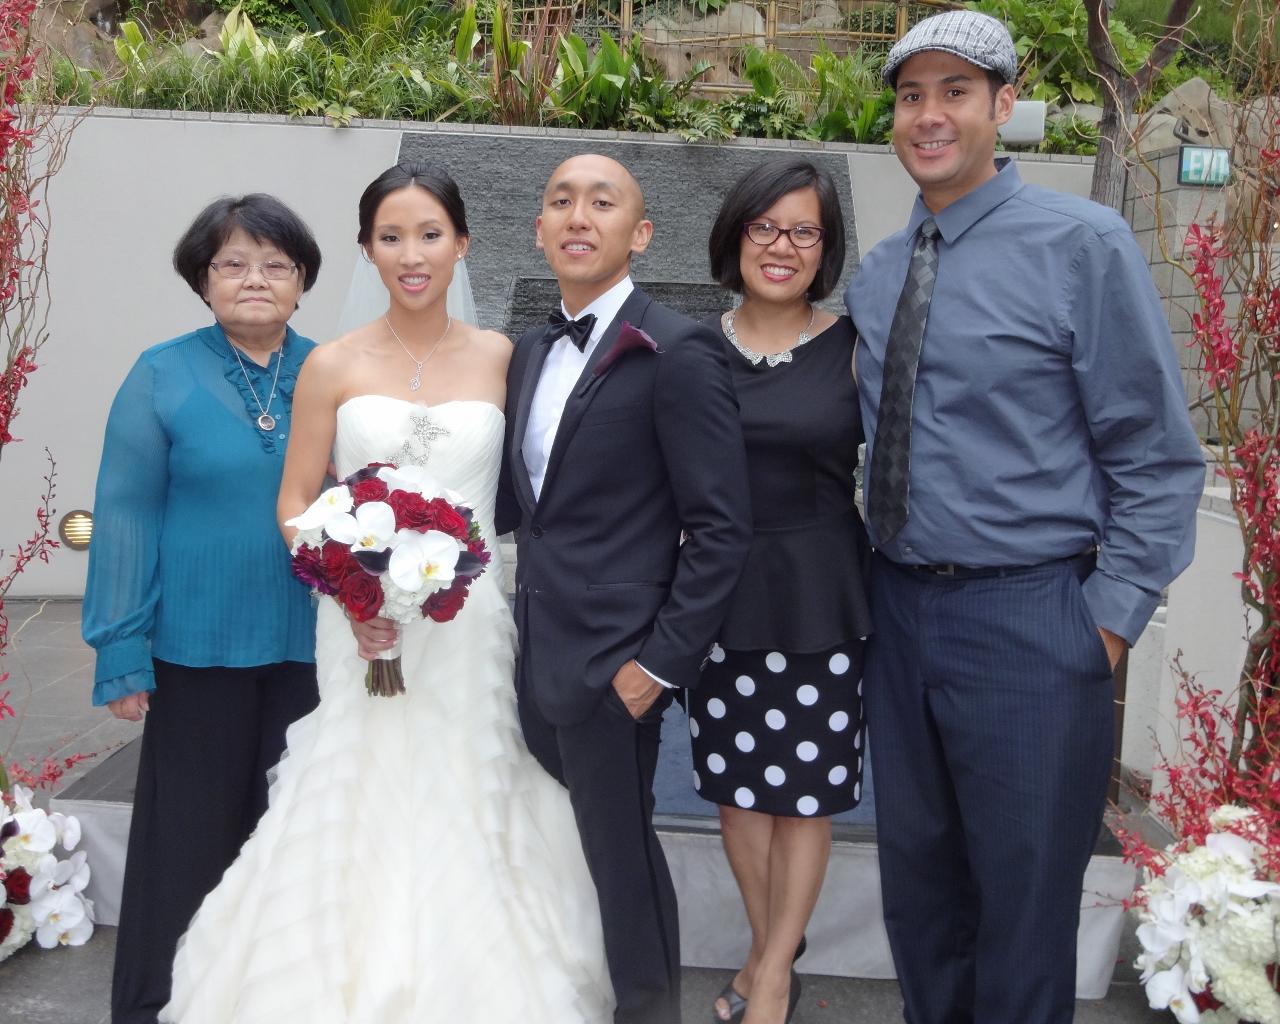 Pauls Wedding Photo 5